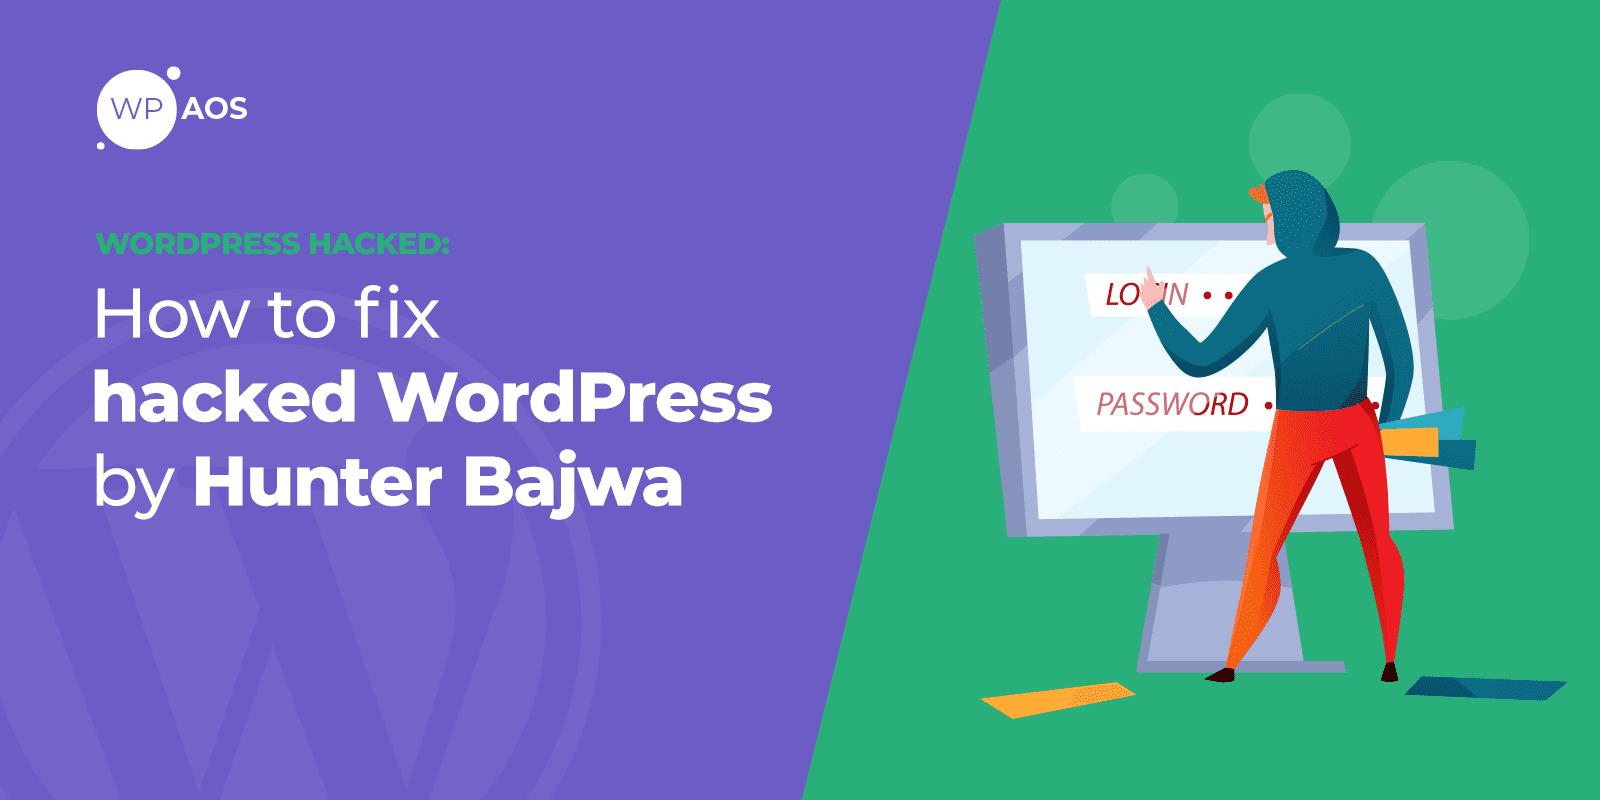 Hacked by Hunter Bajwa, WordPress Error, wpaos